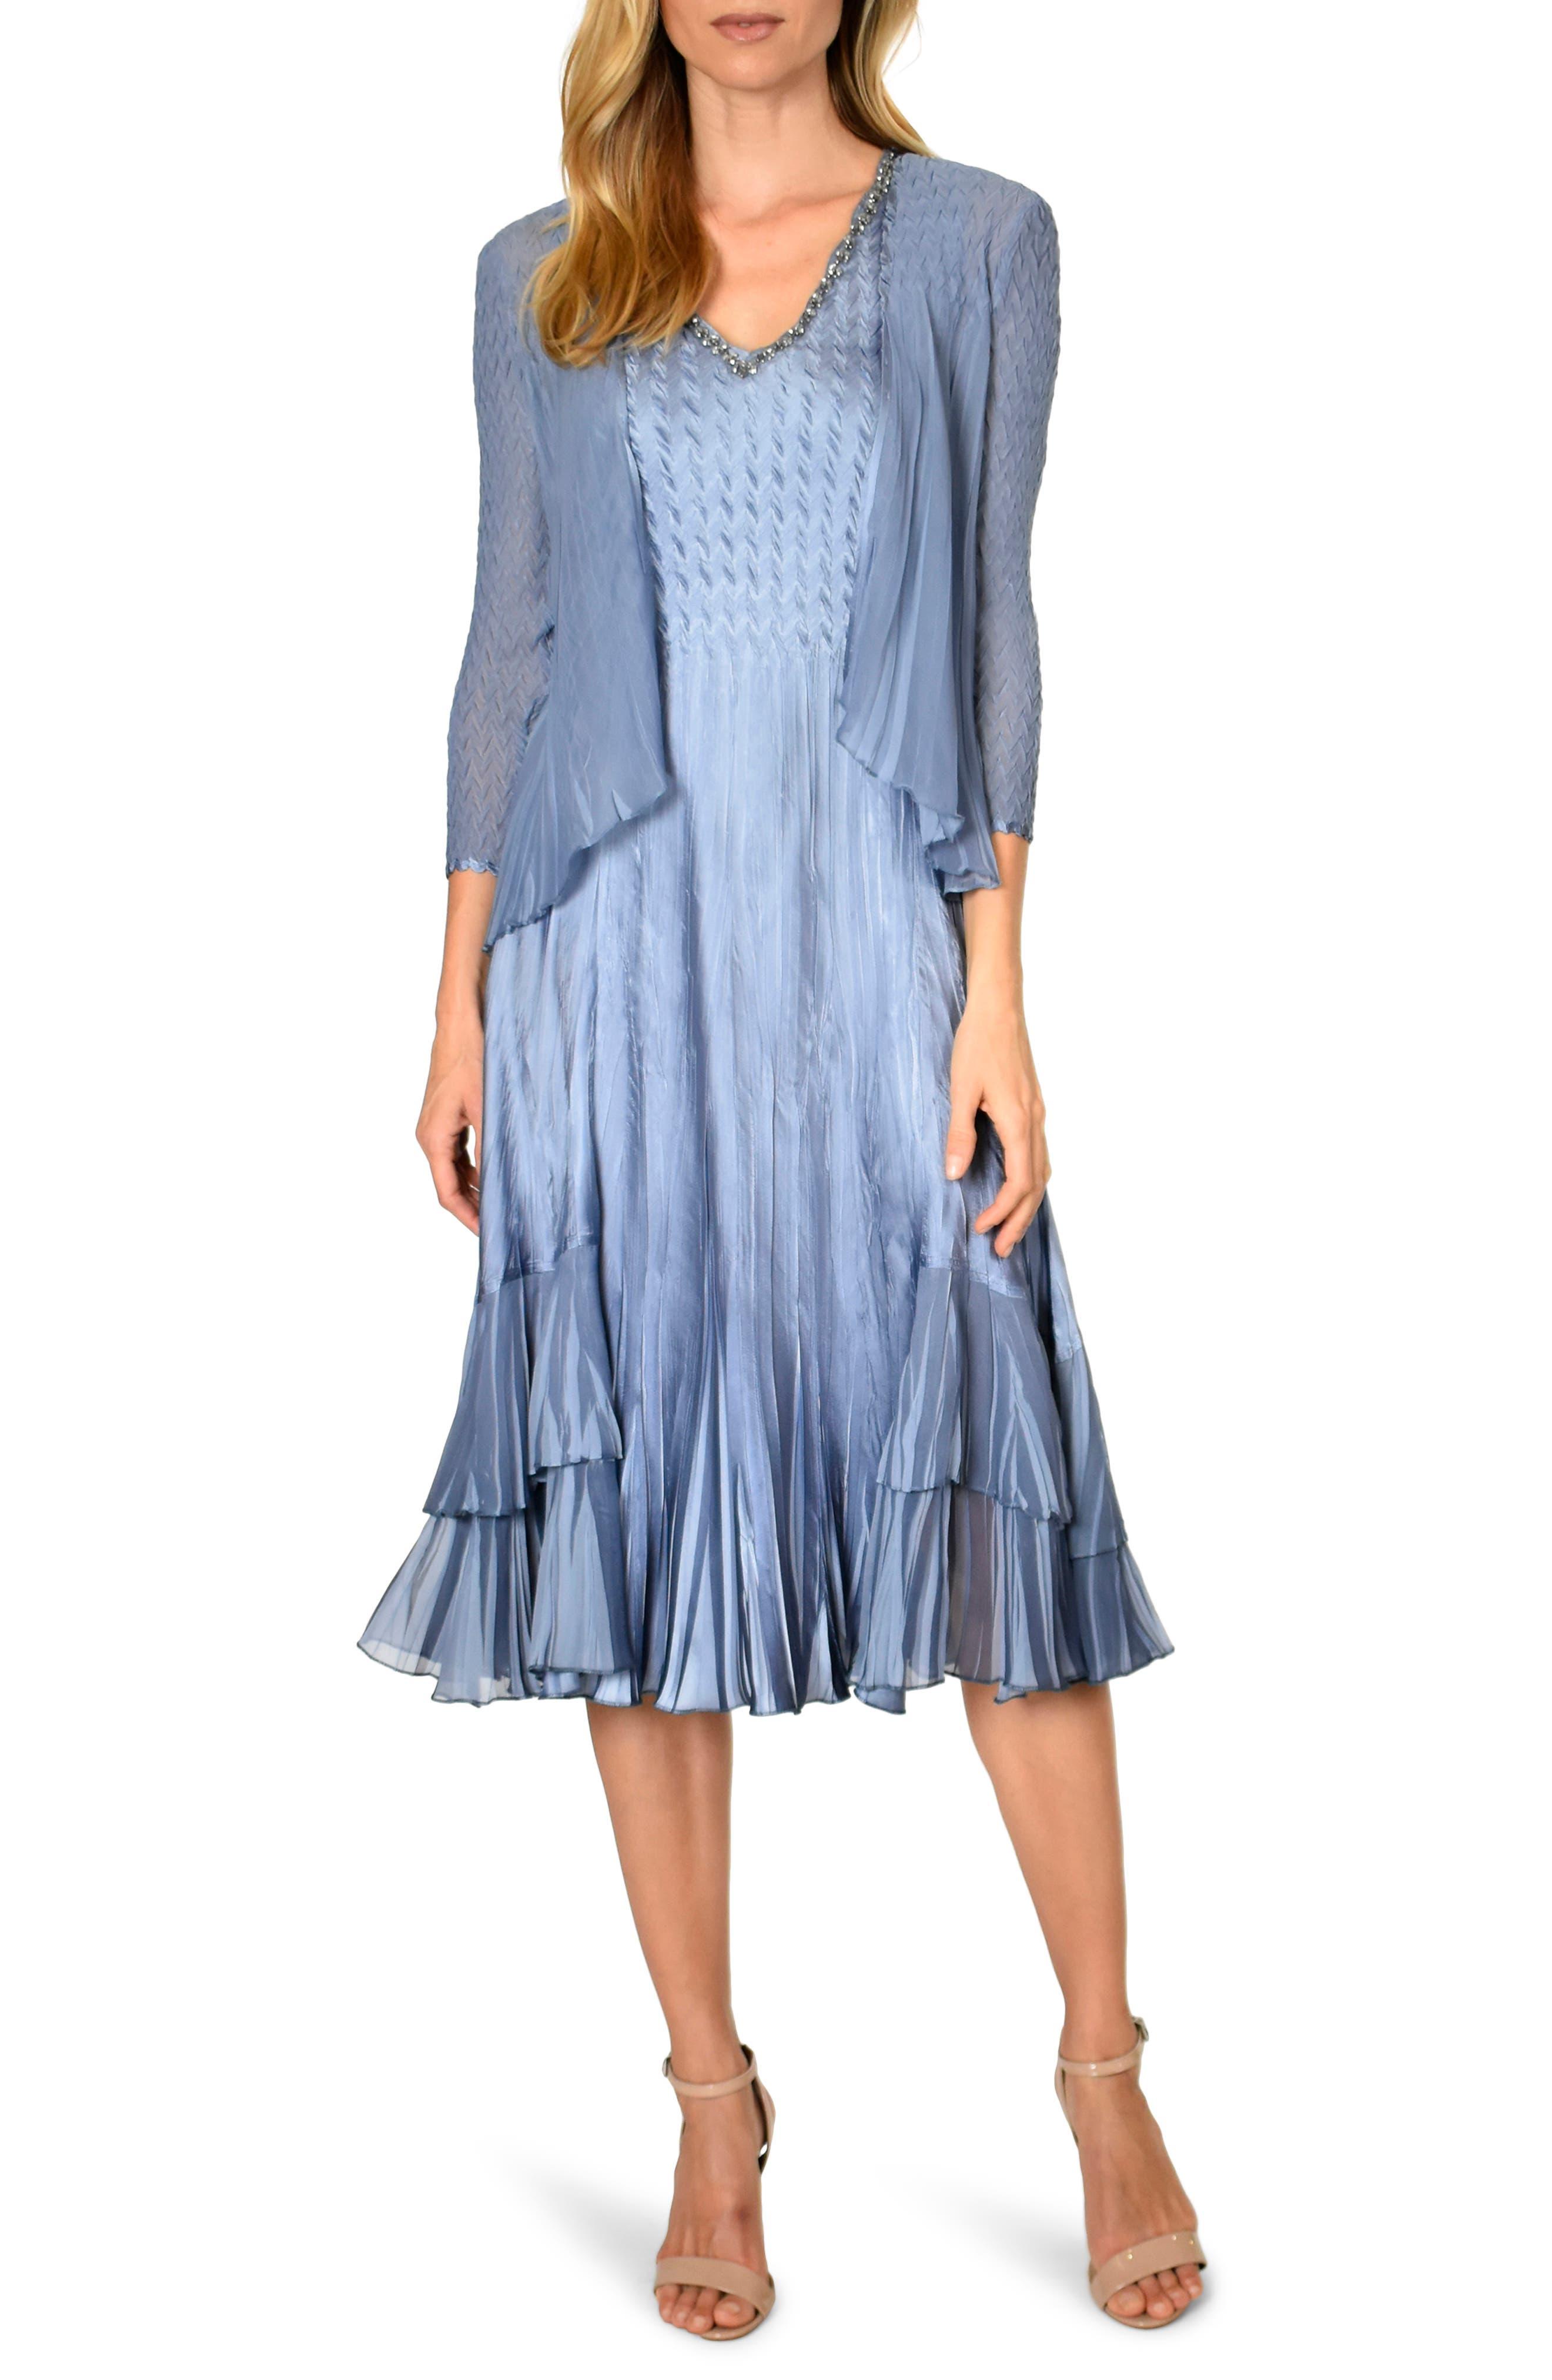 Vintage 1920s Dresses – Where to Buy Womens Komarov Beaded Neck Tiered Hem Charmeuse Dress  Jacket $438.00 AT vintagedancer.com